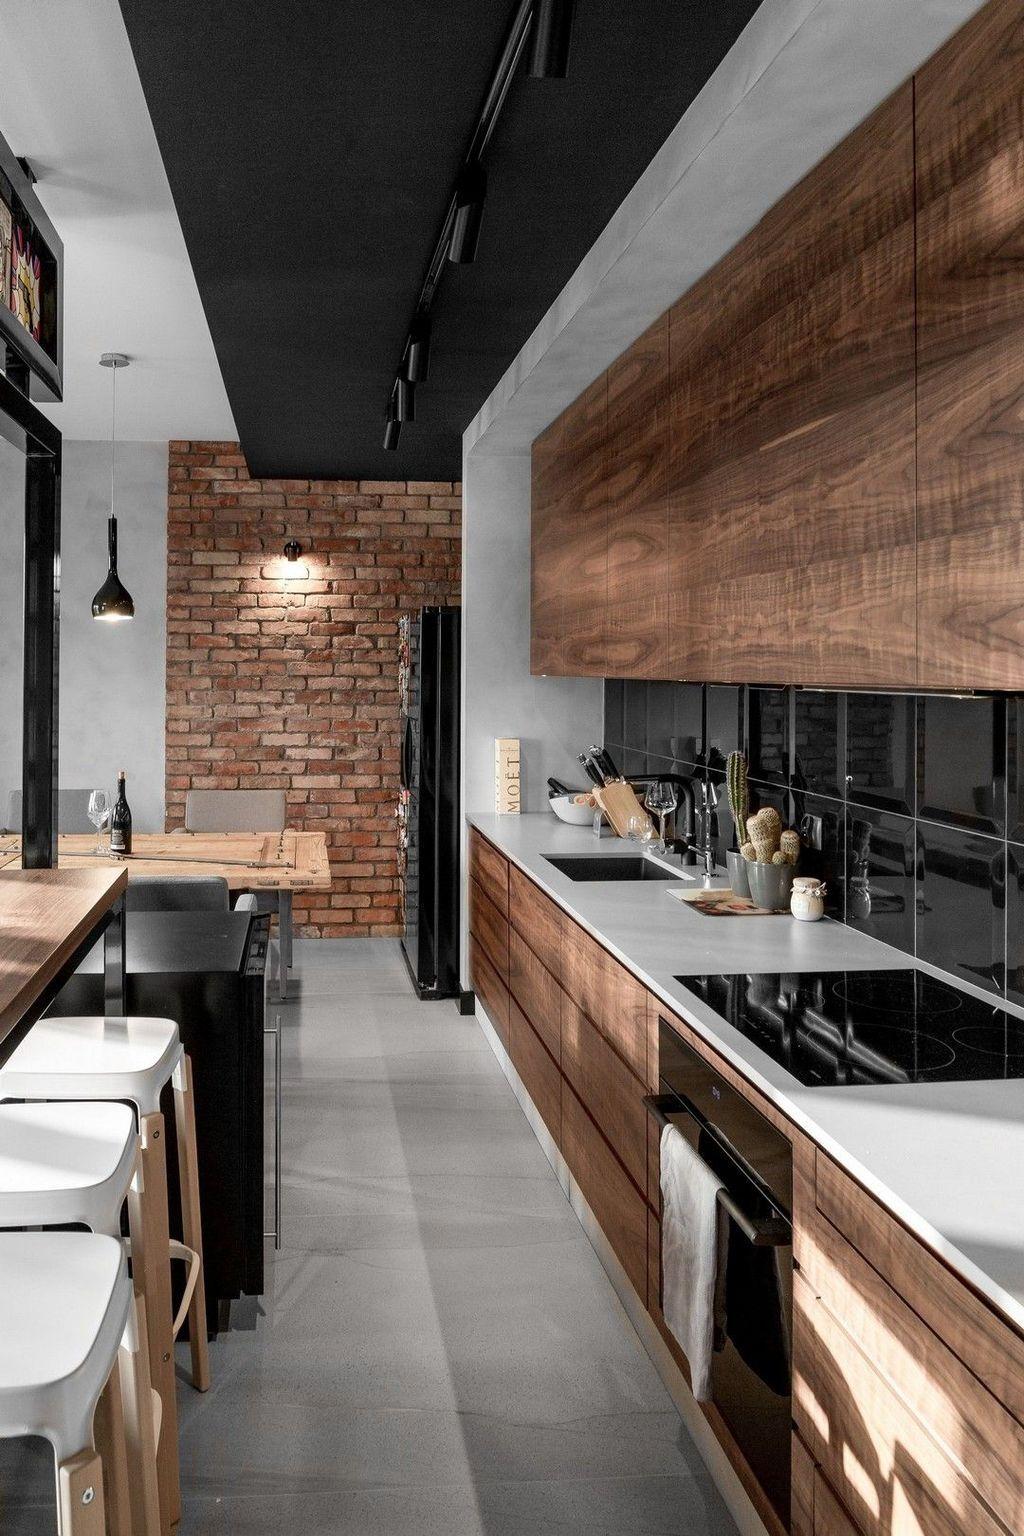 20+ Inexpensive Interior Design Ideas To Copy - TRENDECORS #moderninteriordesign